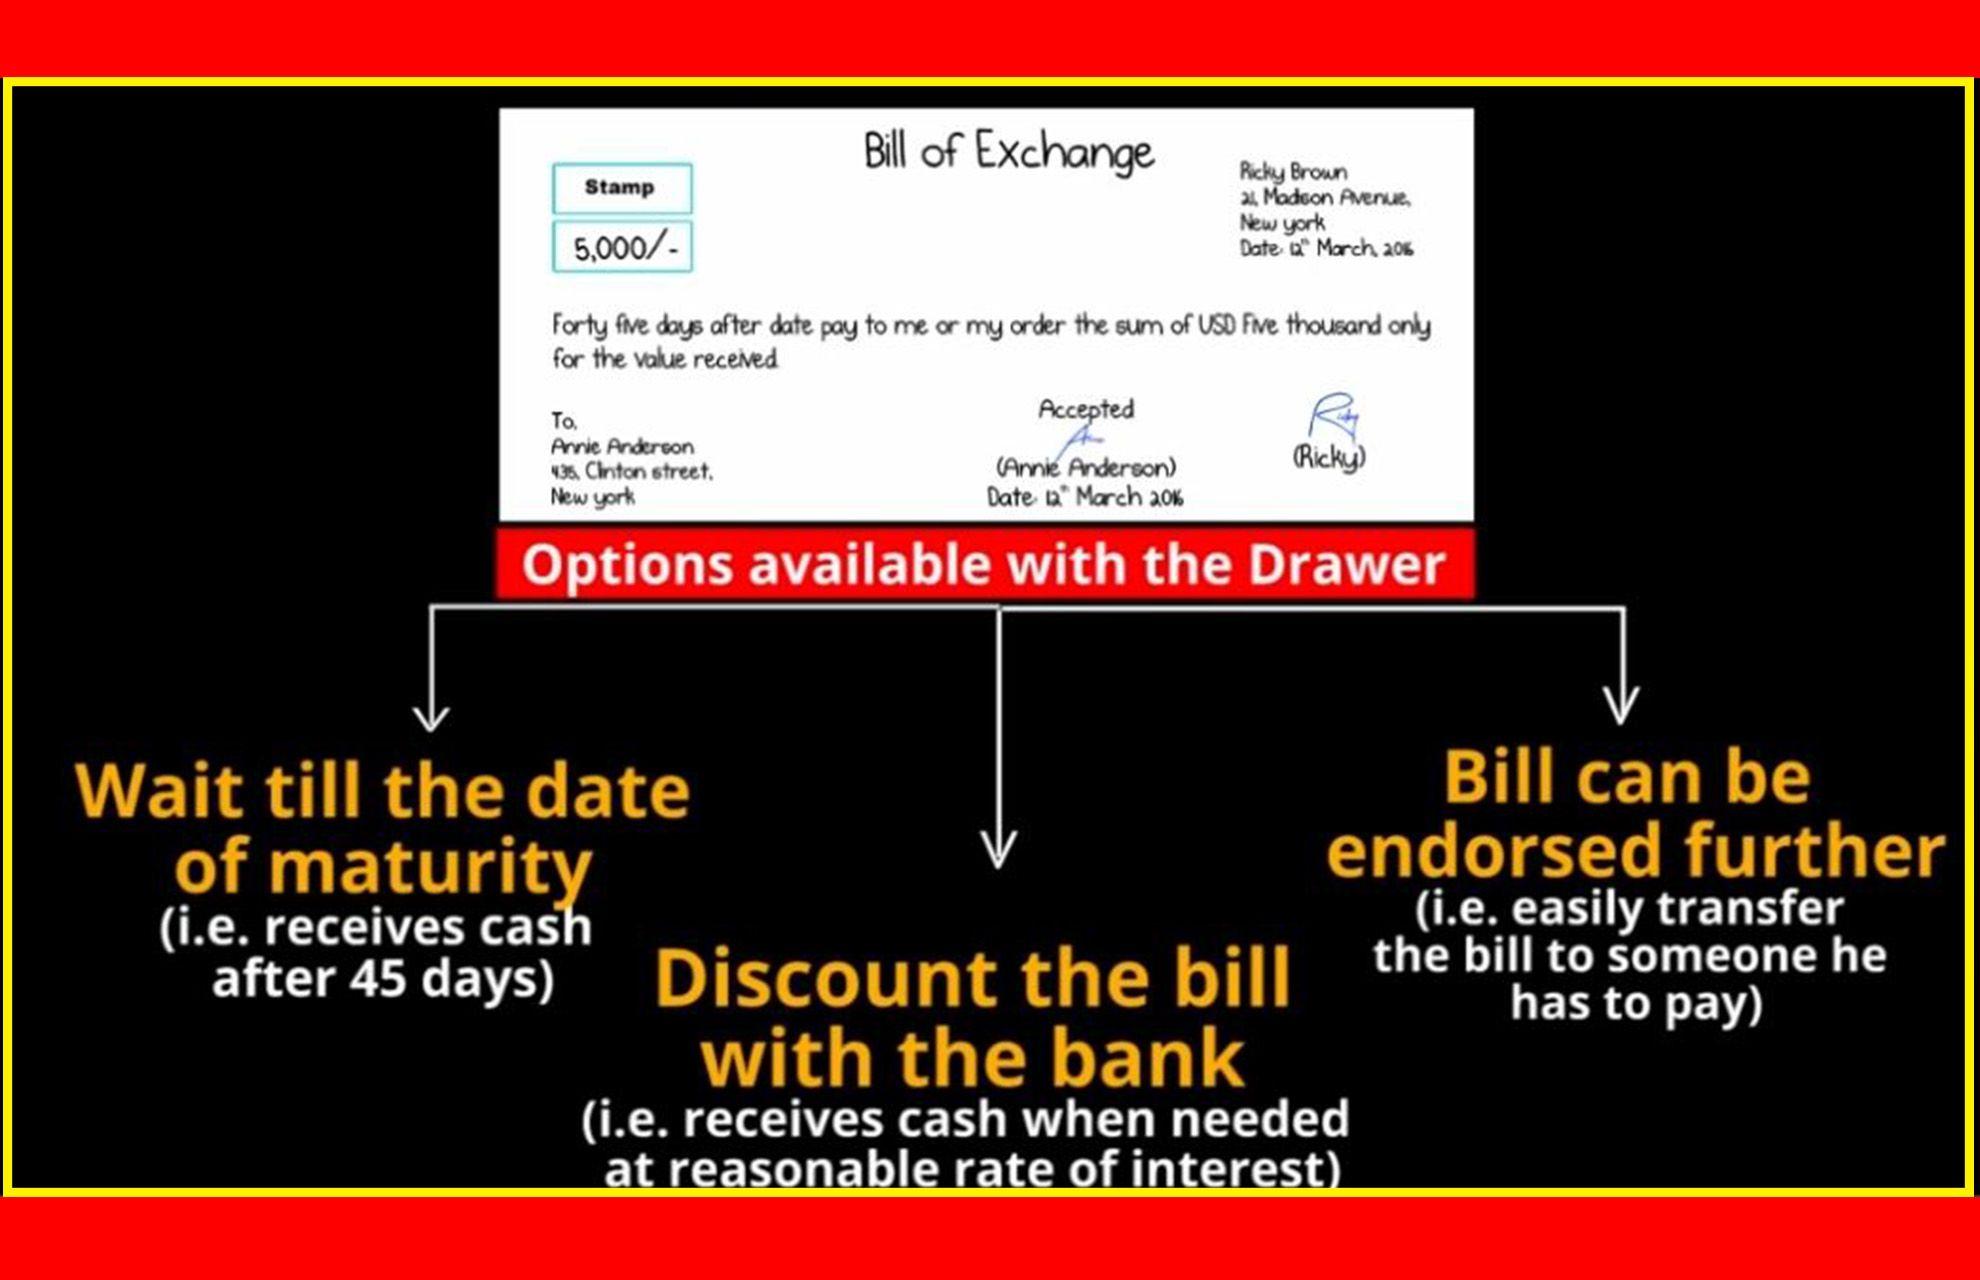 Bill Of Exchange Get Videos To Understand Better With